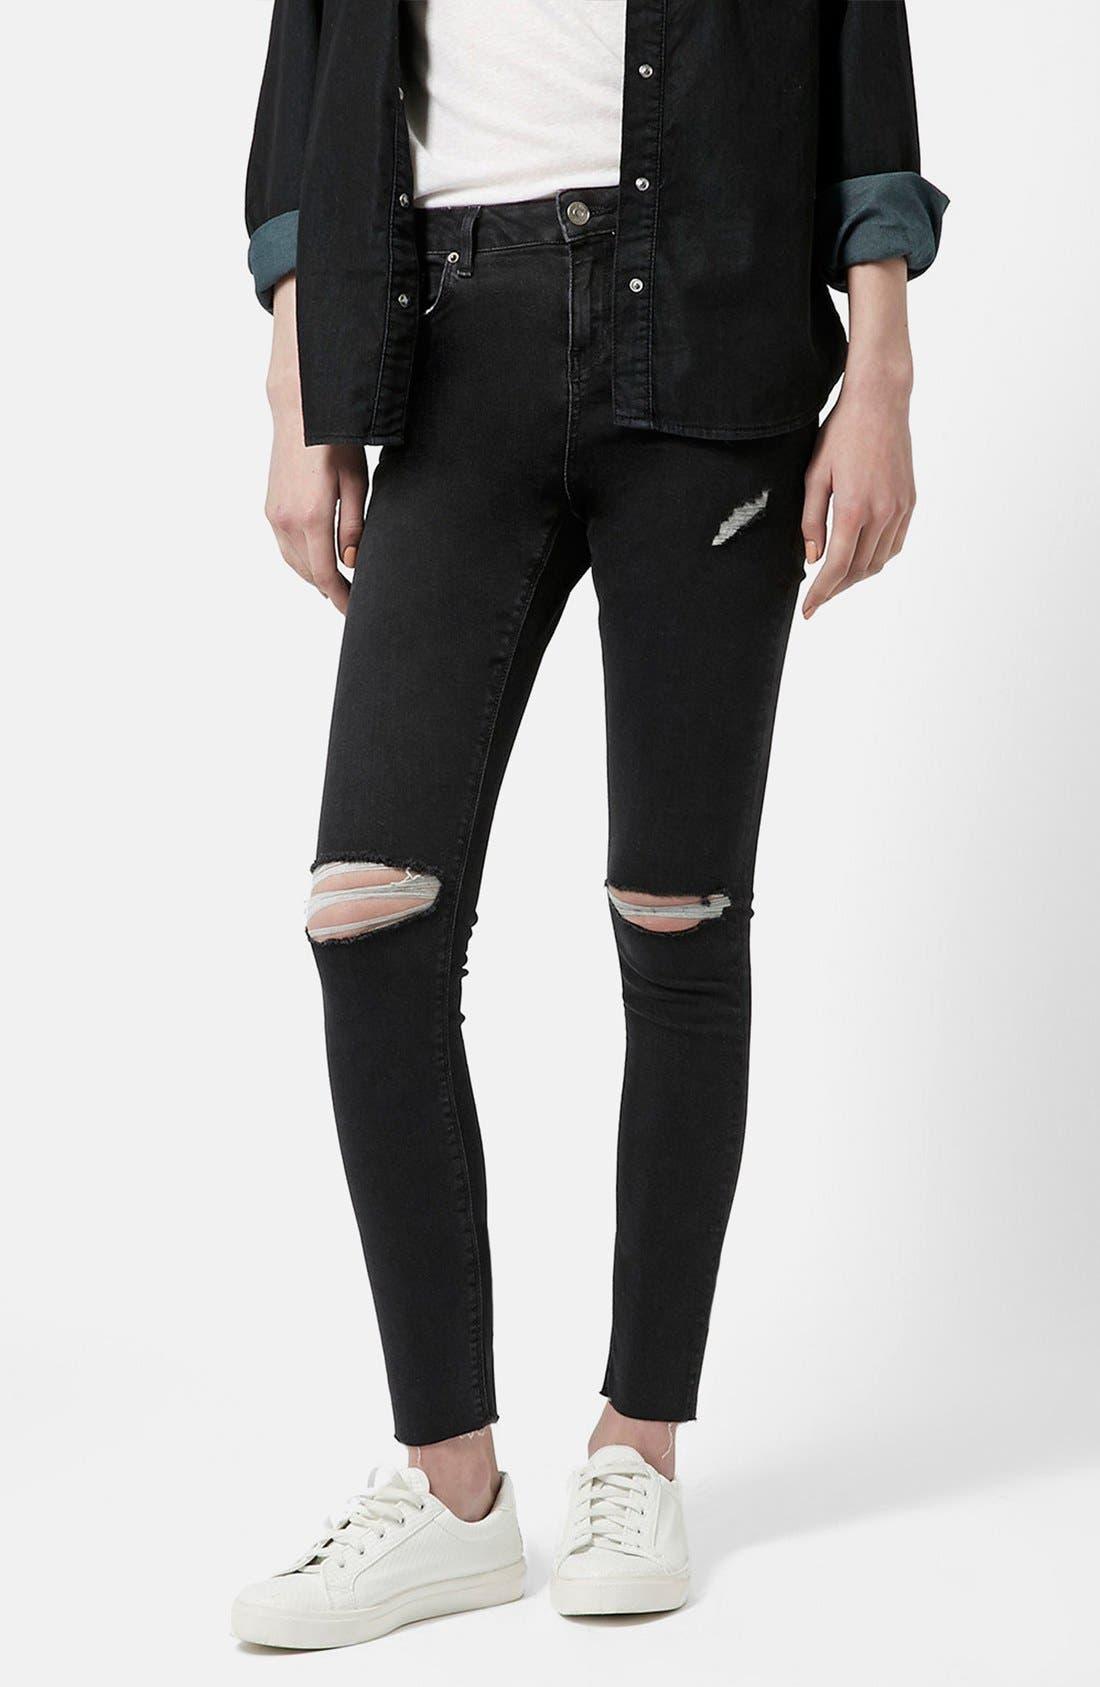 Main Image - Topshop 'Jamie' Ripped Skinny Jeans (Black) (Petite)